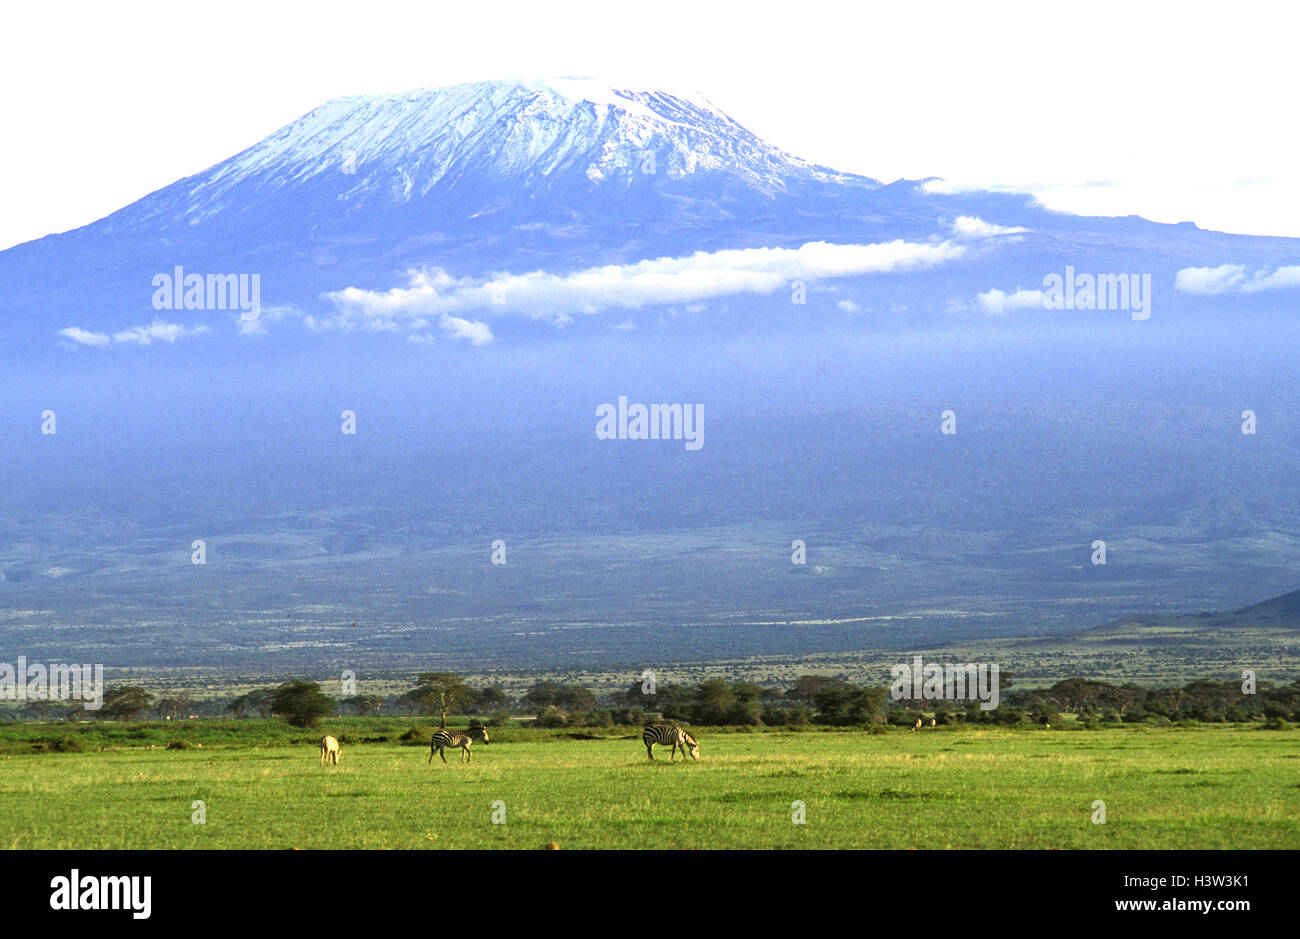 Mount Kilimanjaro, 5895 m, - Stock Image